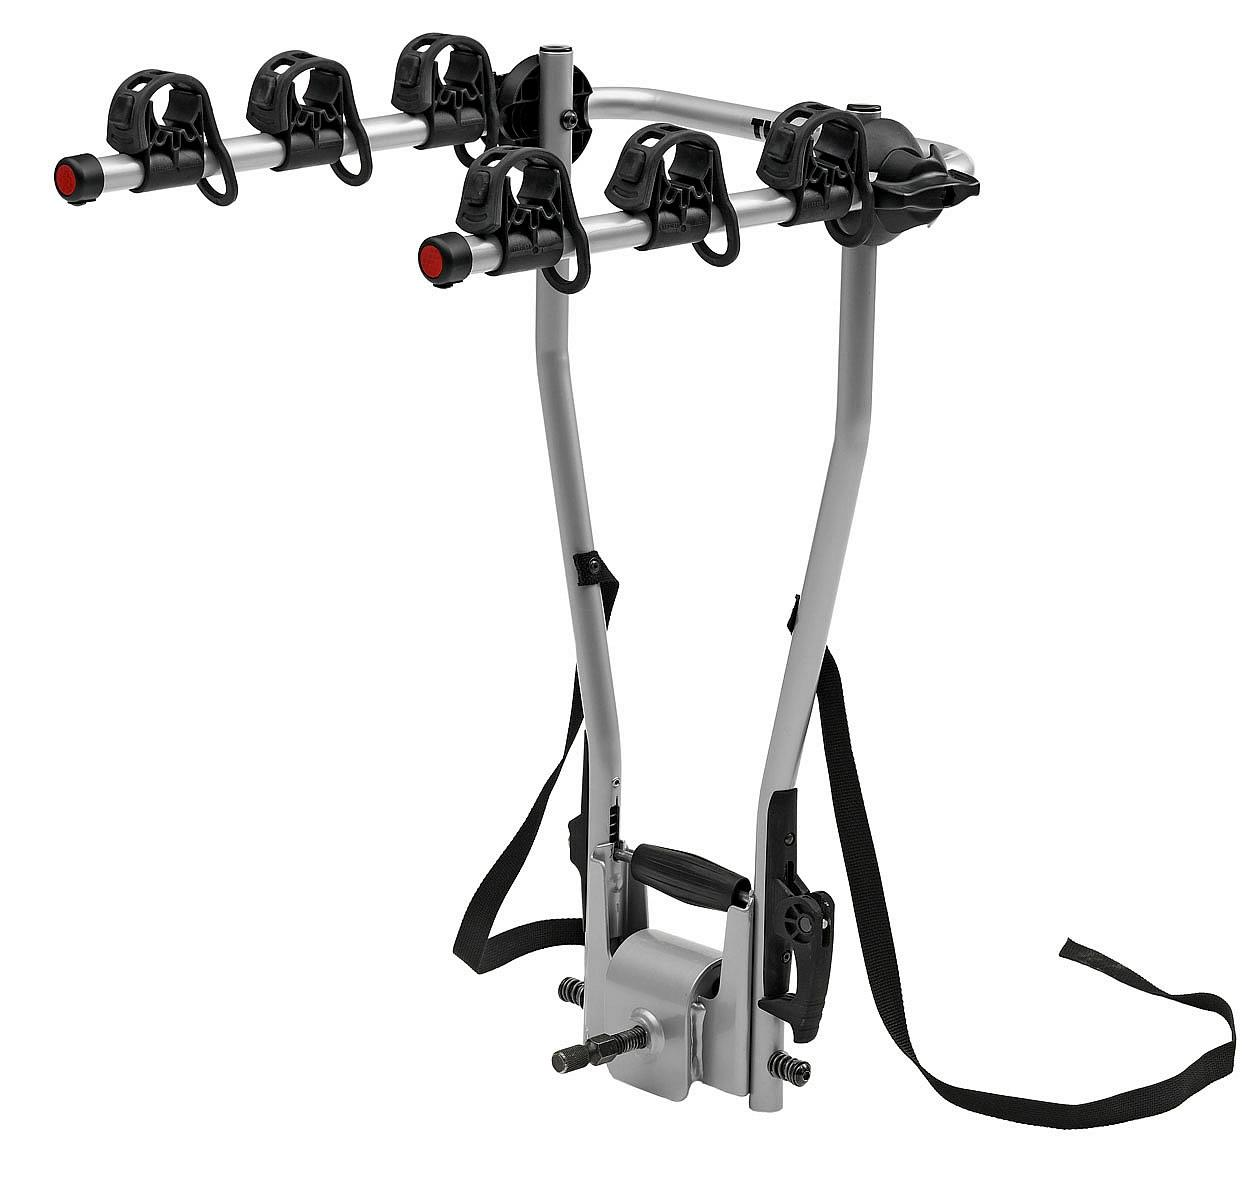 Image of Thule HangOn 972 3-Bike Towball Rear Mount Carrier